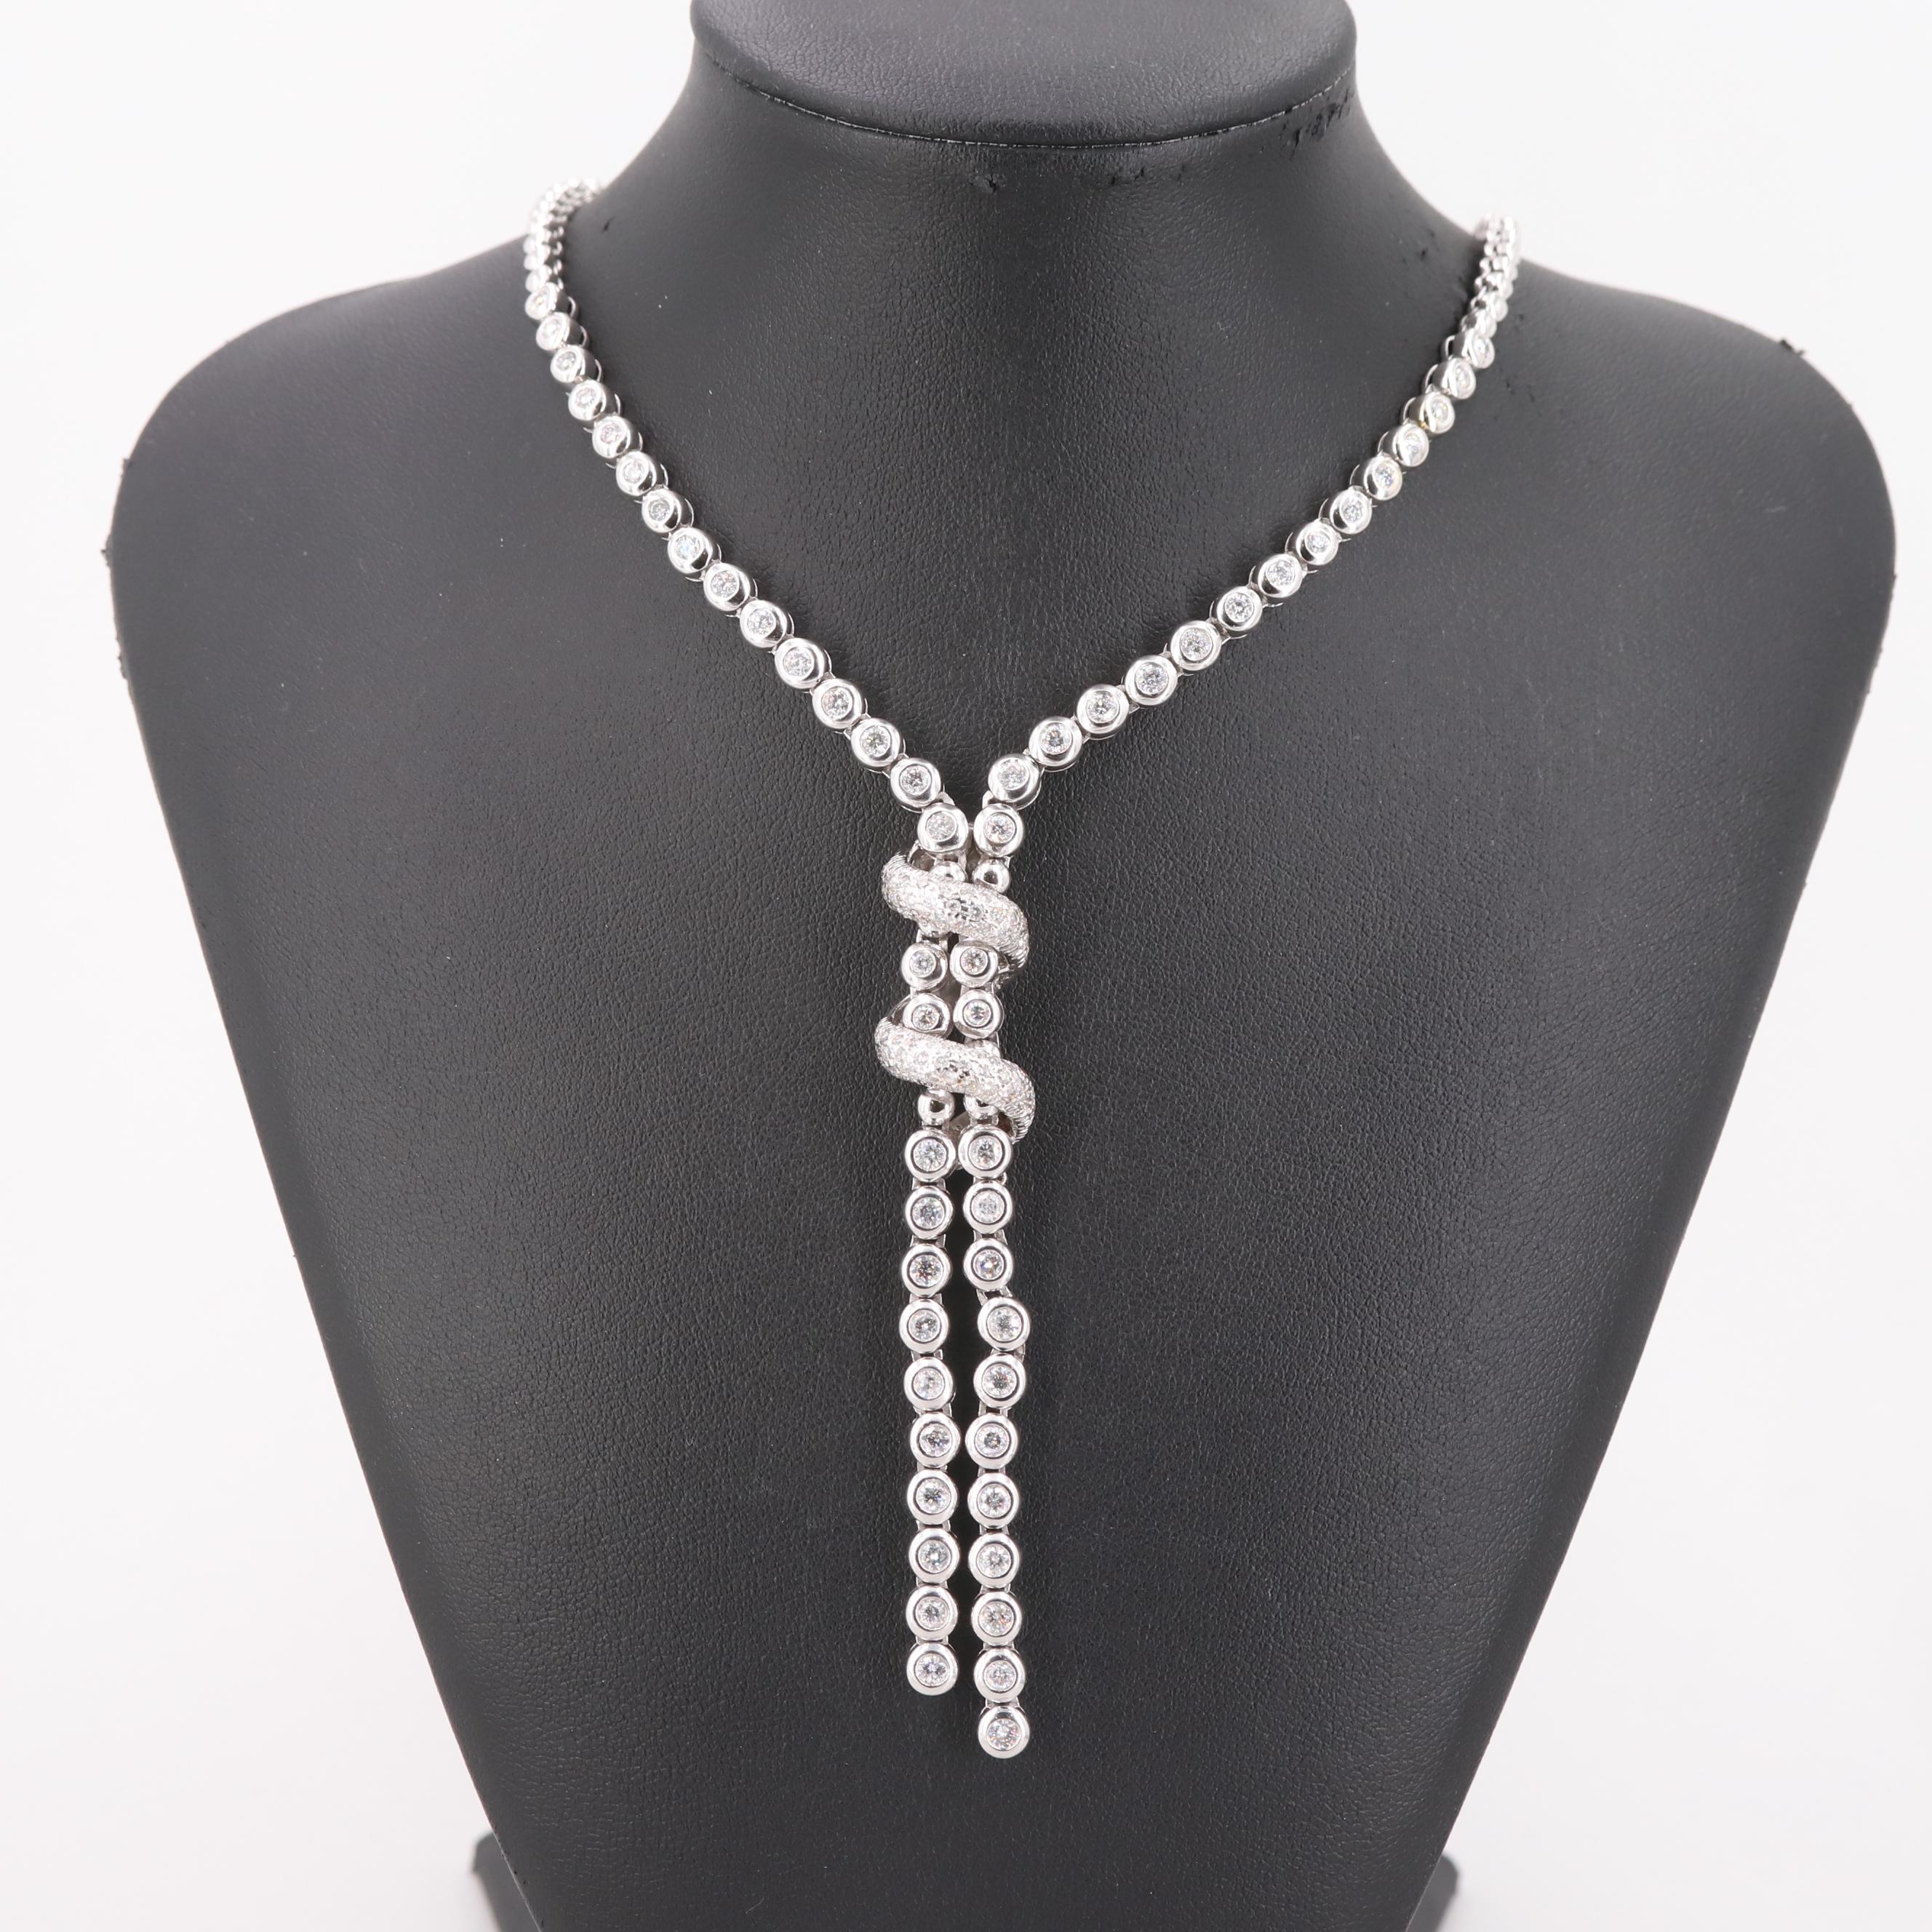 14K White Gold Bezel Set 4.25 CTW Diamond Bolo Necklace